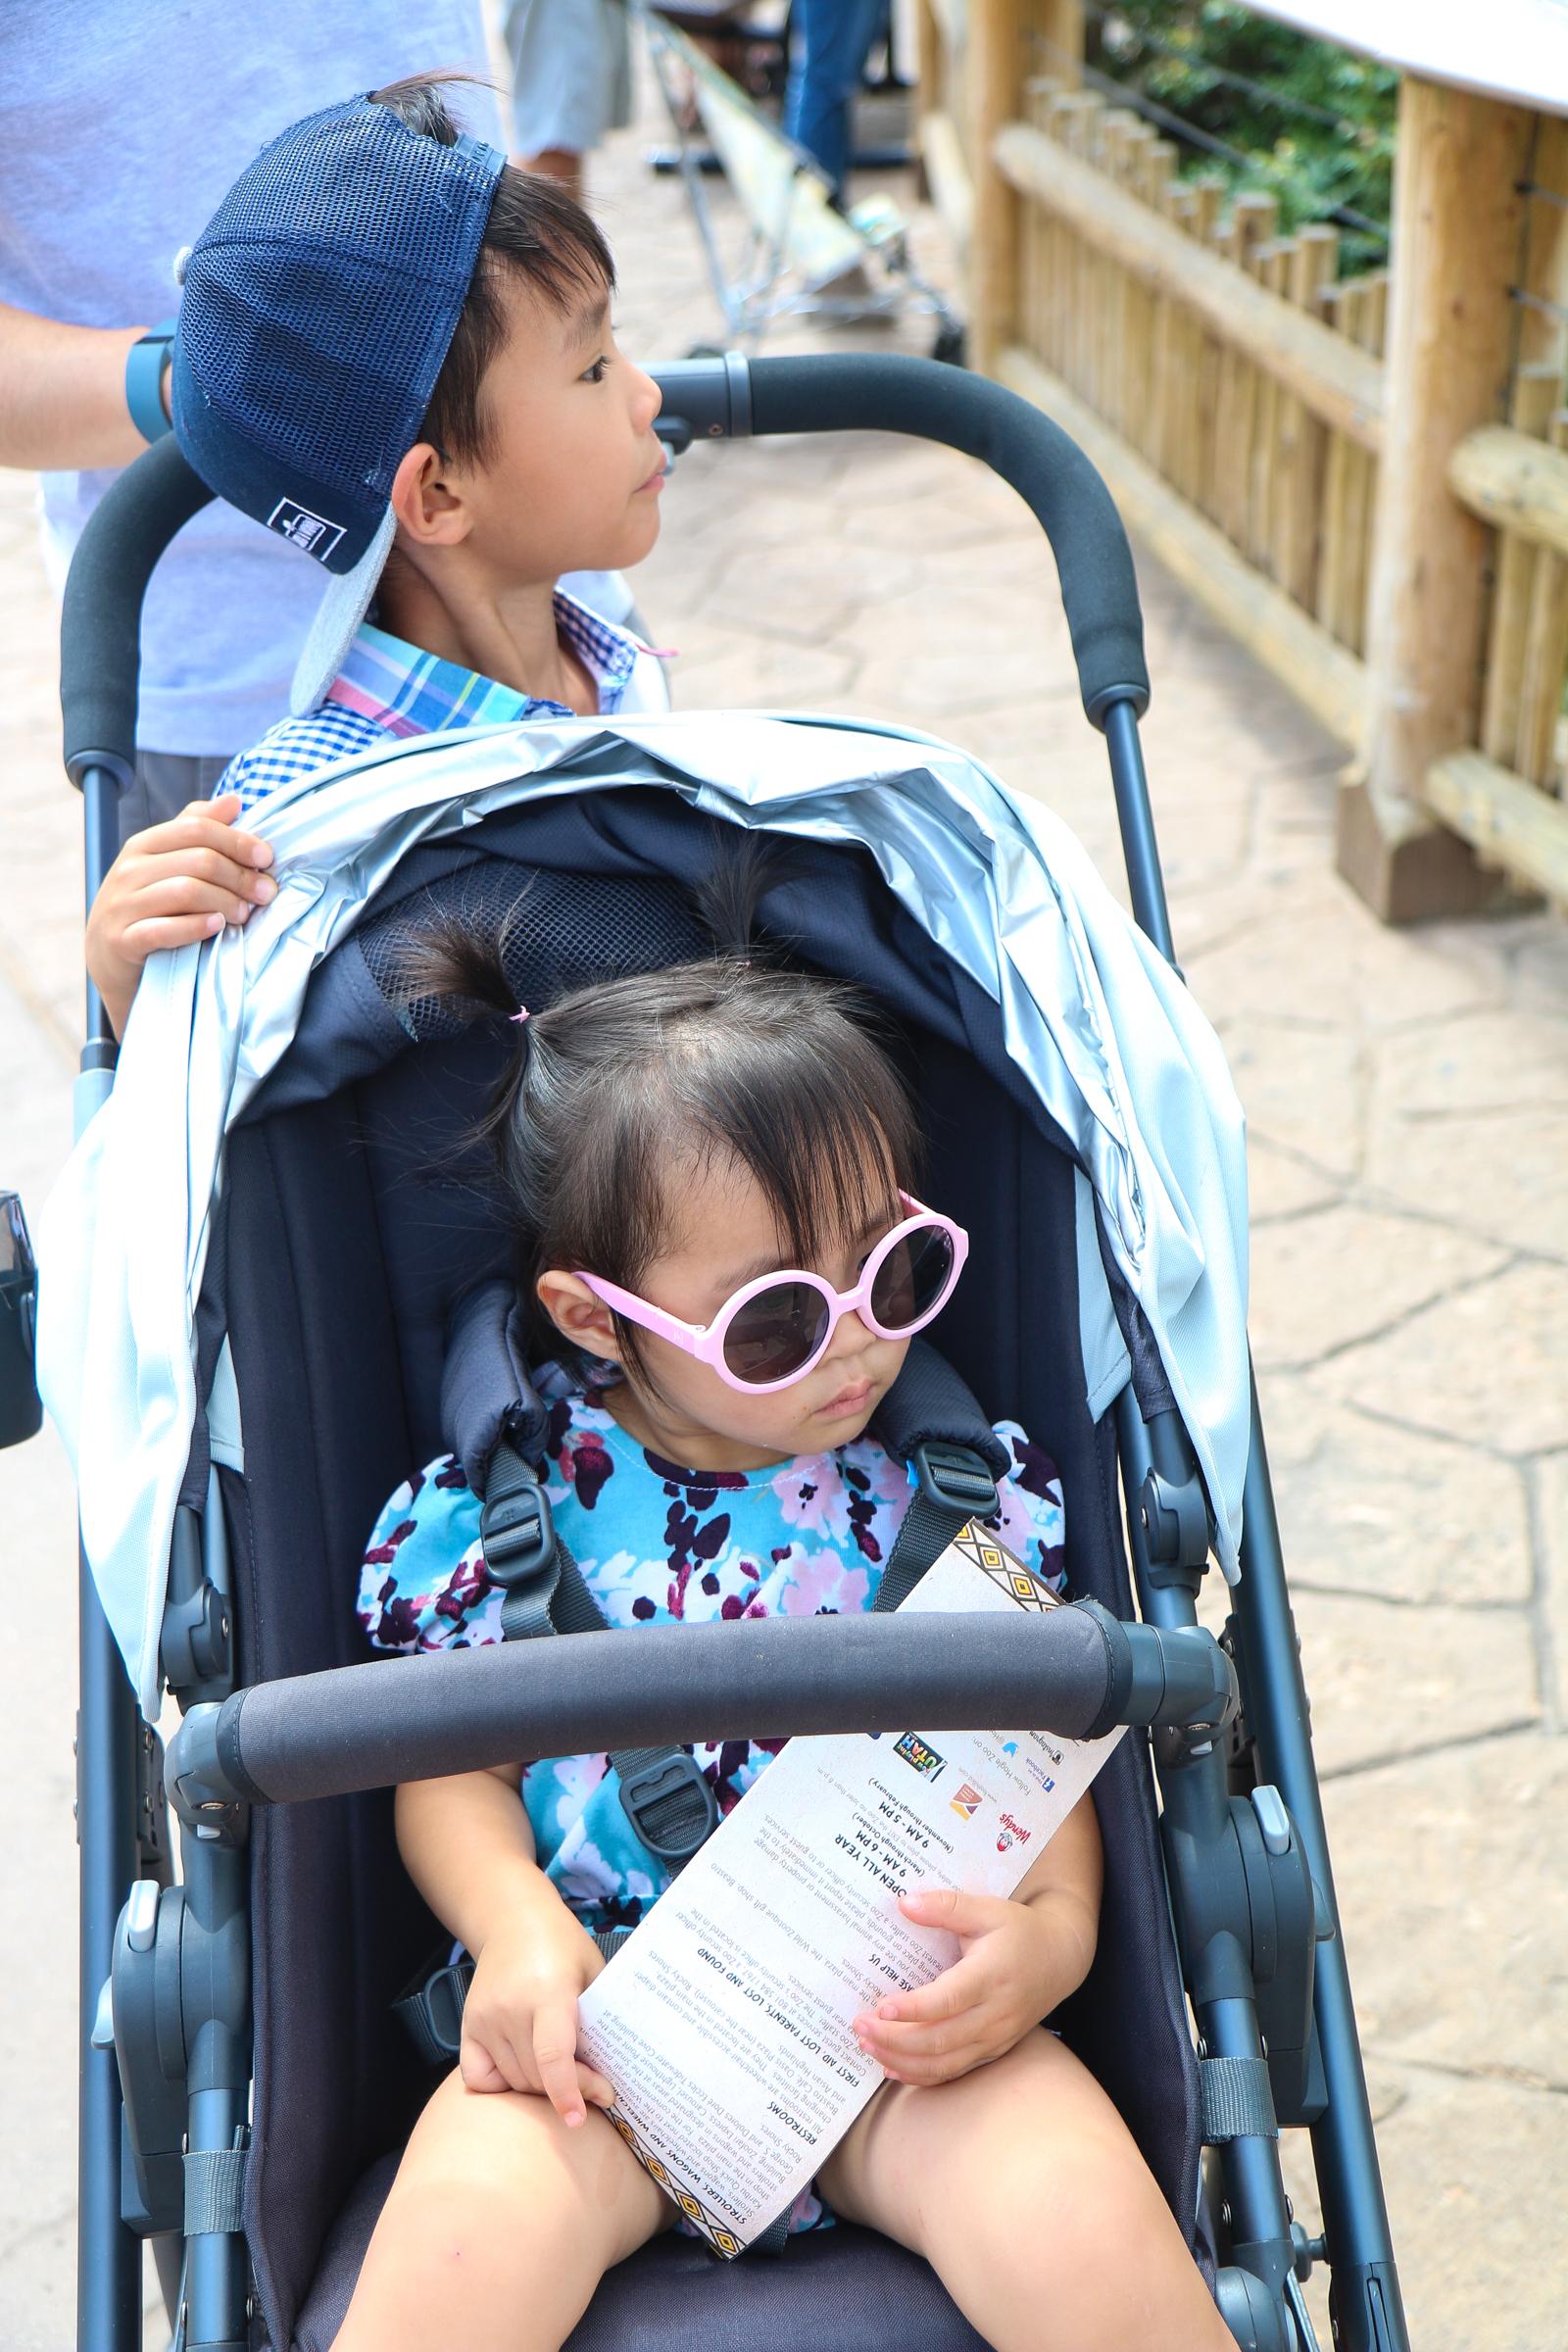 Best stroller for two kids